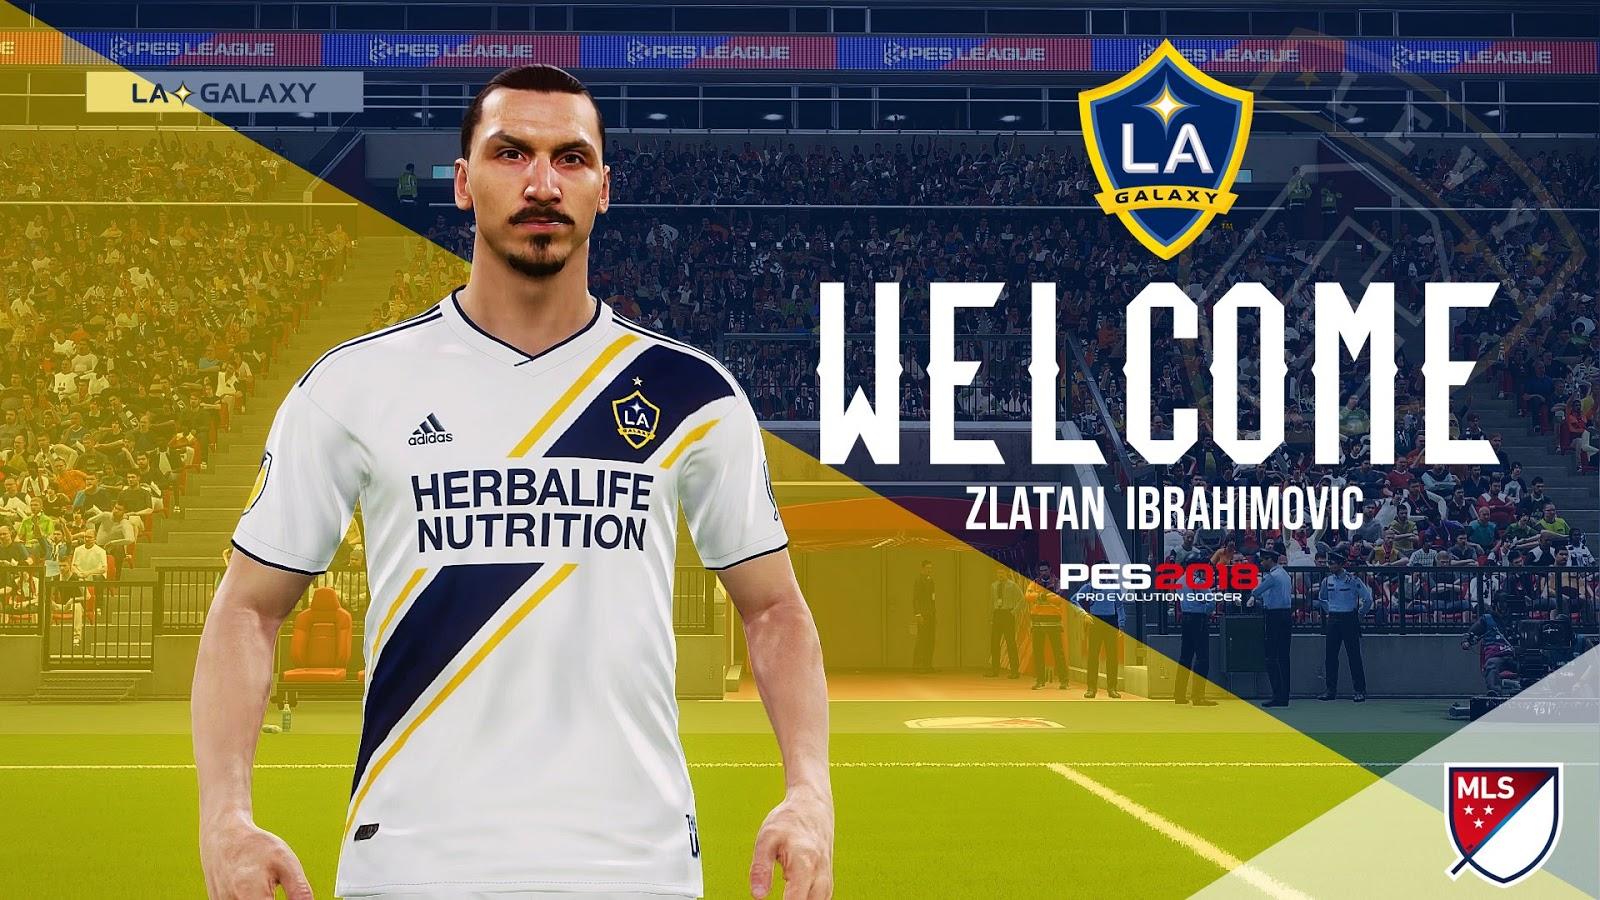 PES 17/18 Ibrahimović Start Screen (LA Galaxy) by Last Fiddler